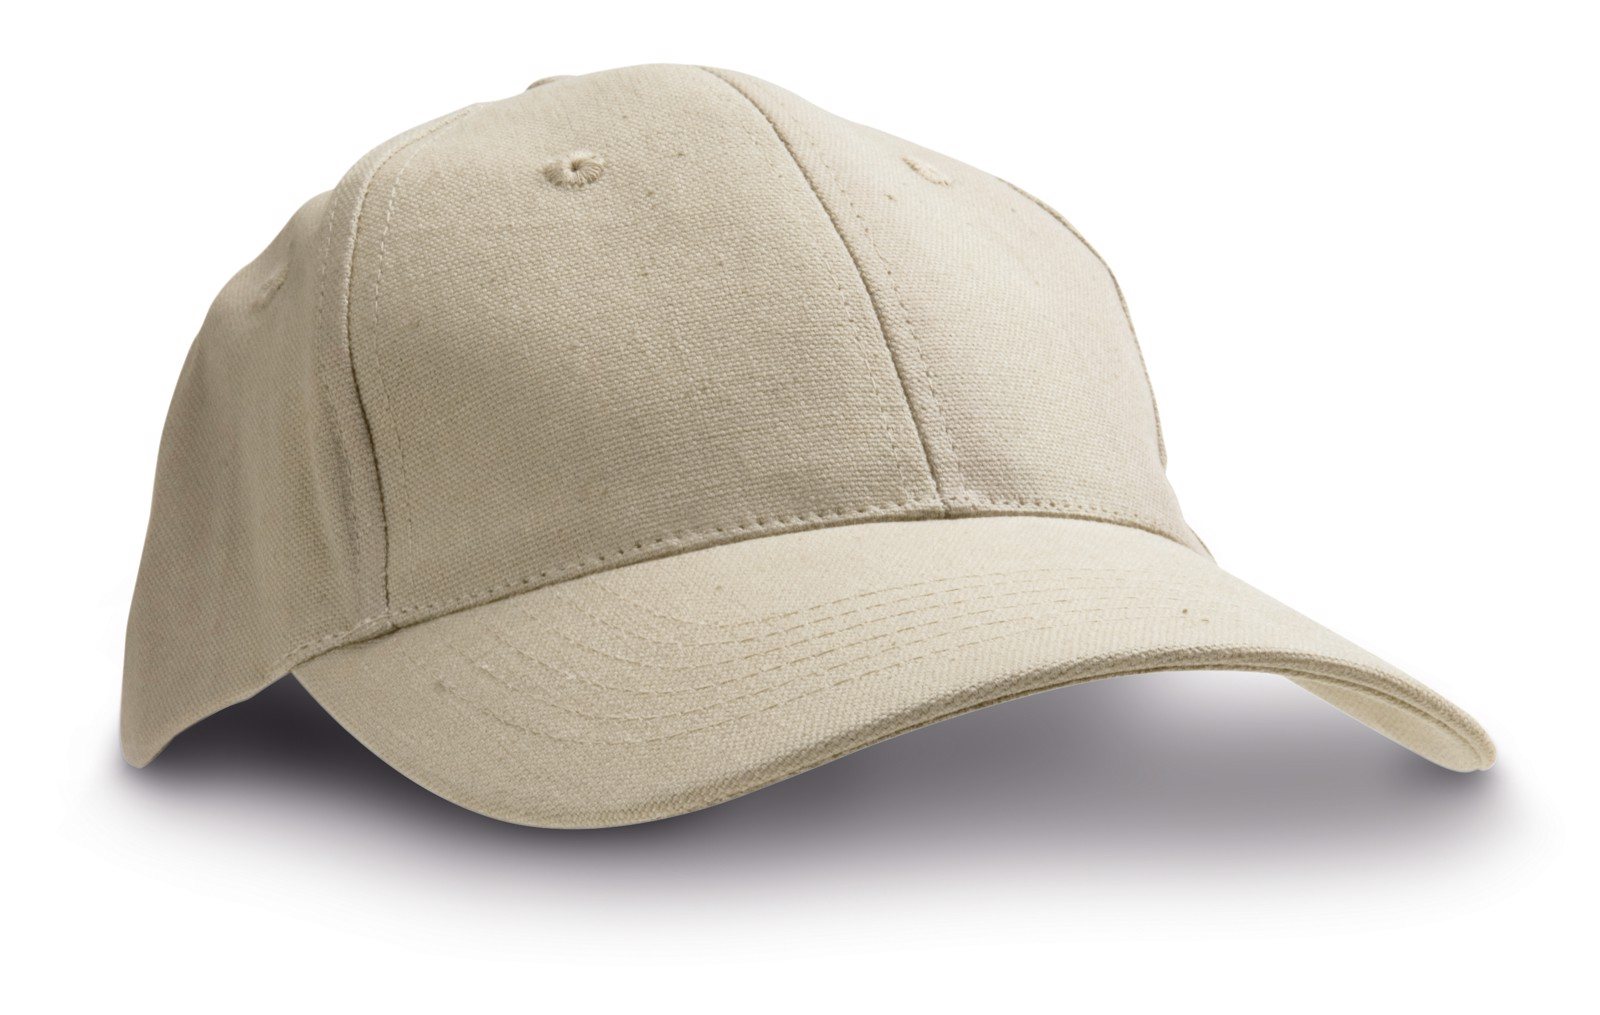 CHRISTIAN. Καπέλο με καμβά από 100% βαμβάκι - Μπεζ